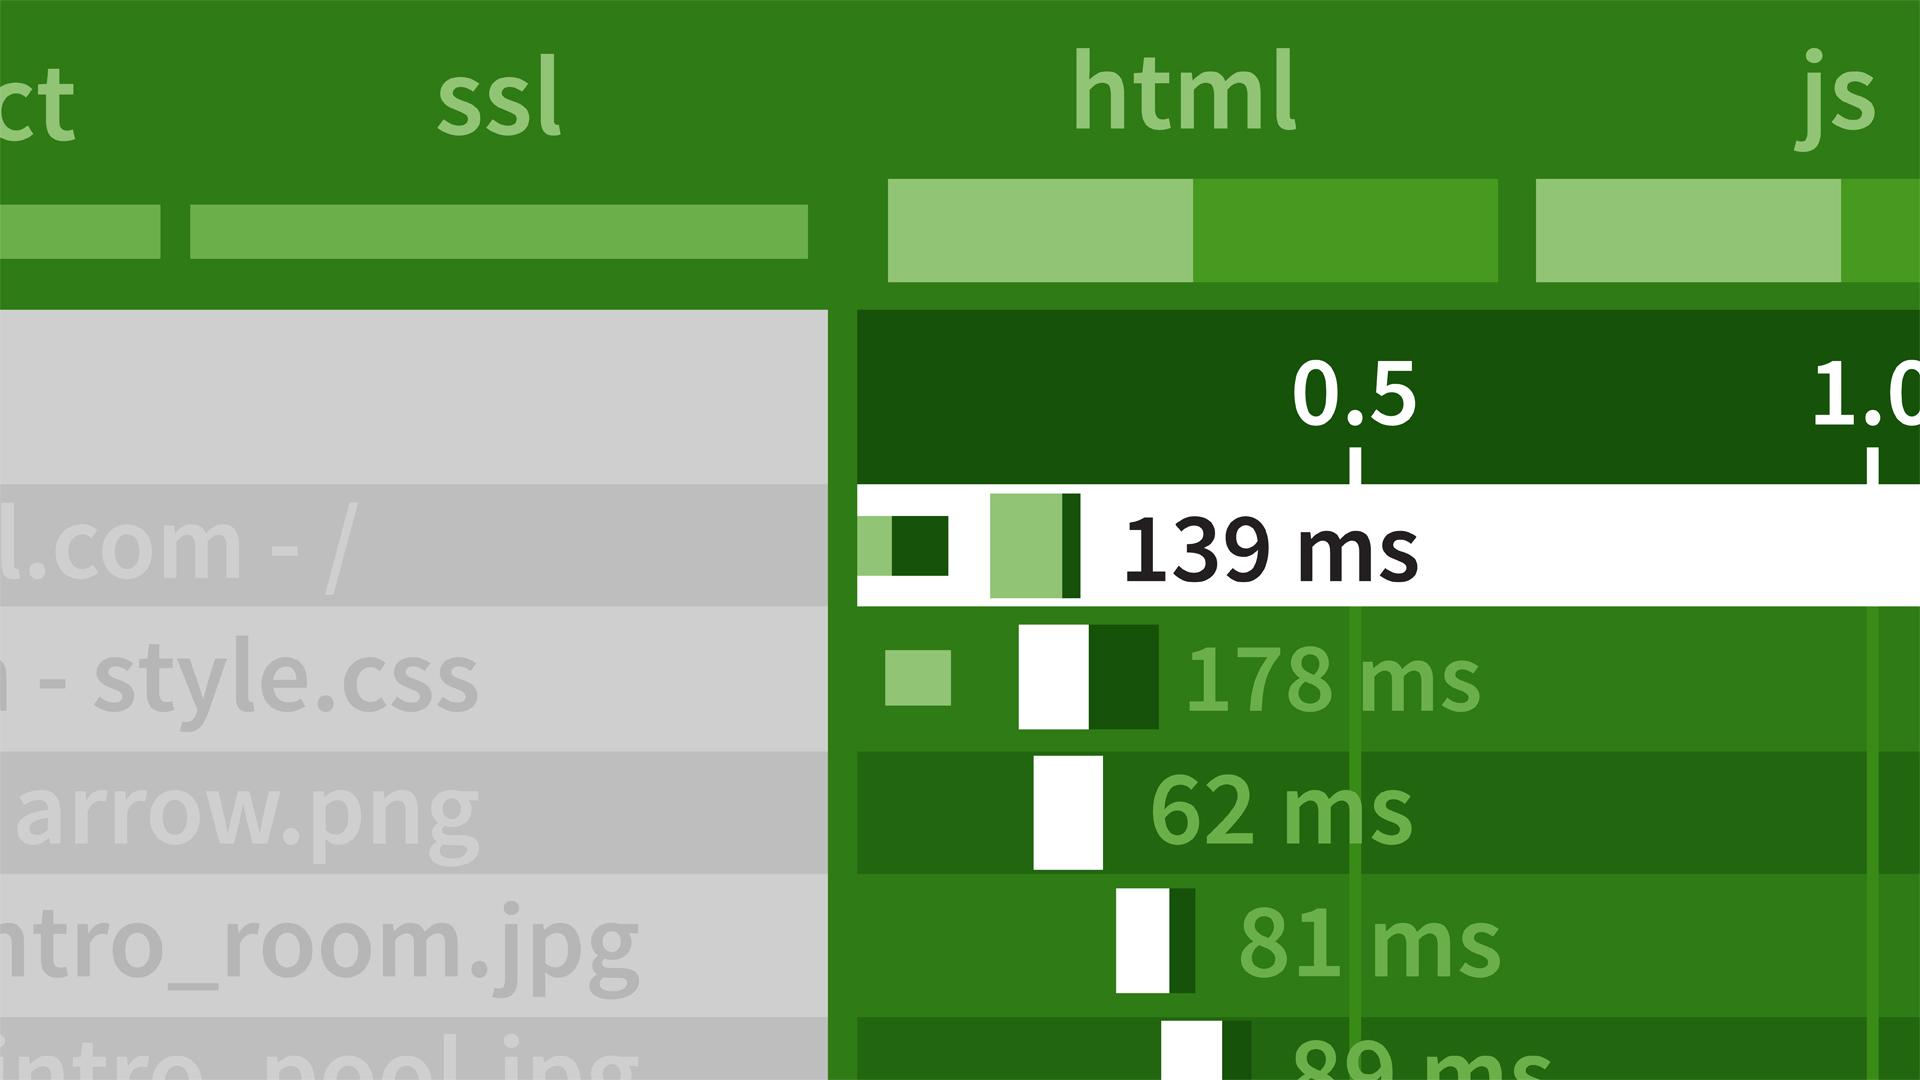 Using Firefox developer tools